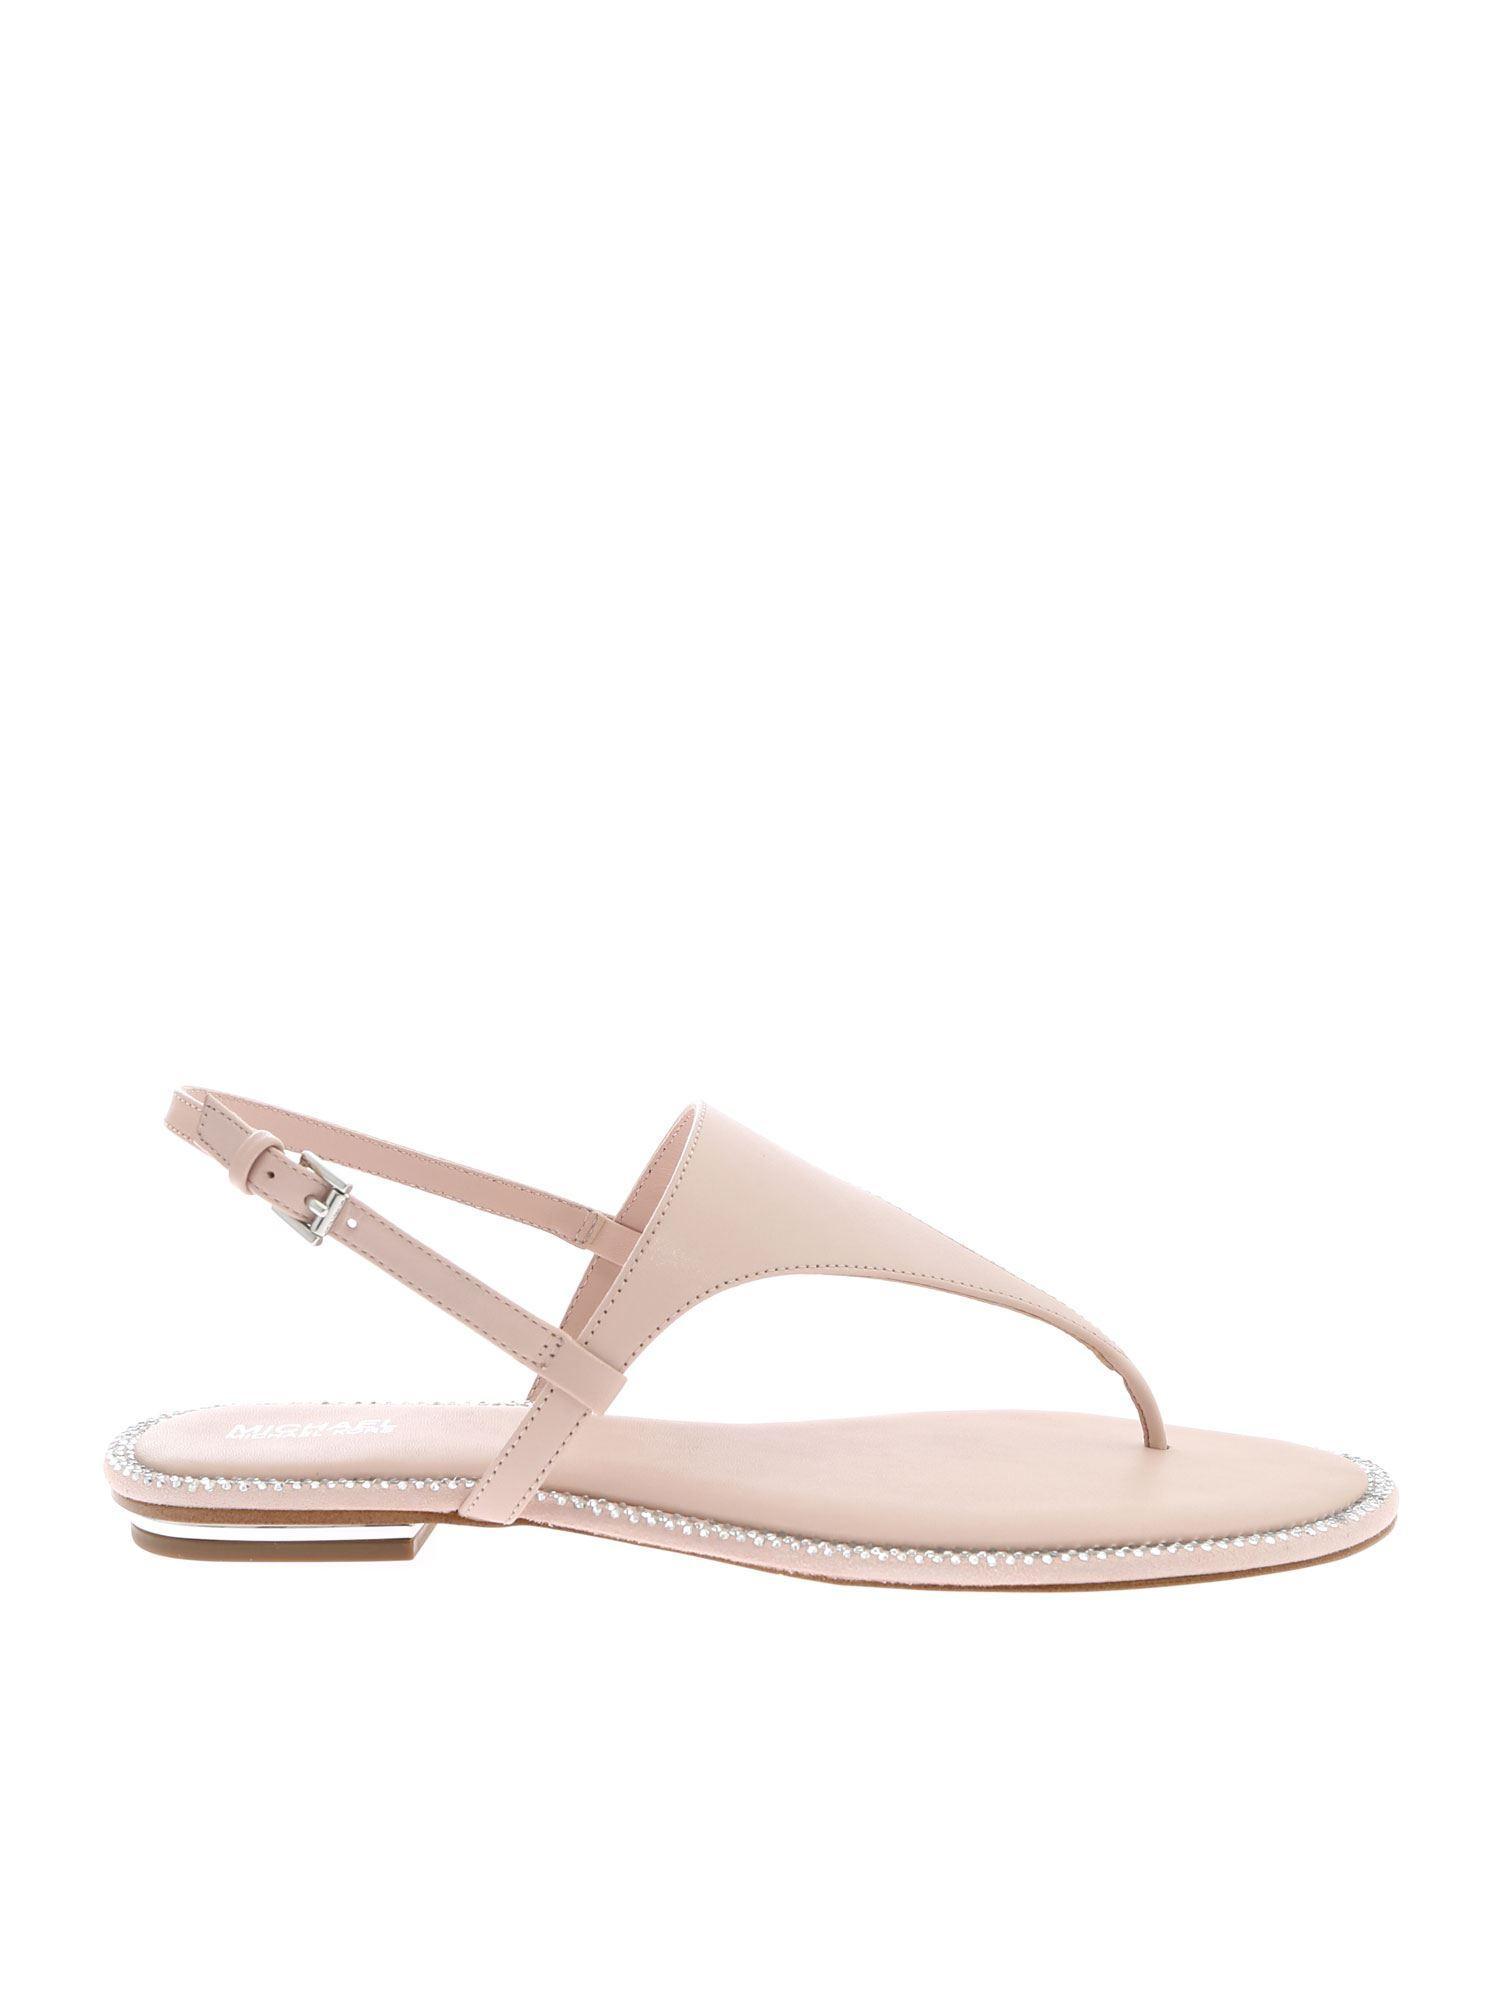 fbf3caeb72d Lyst - Michael Kors Michael Enid Thong Sandals in Pink